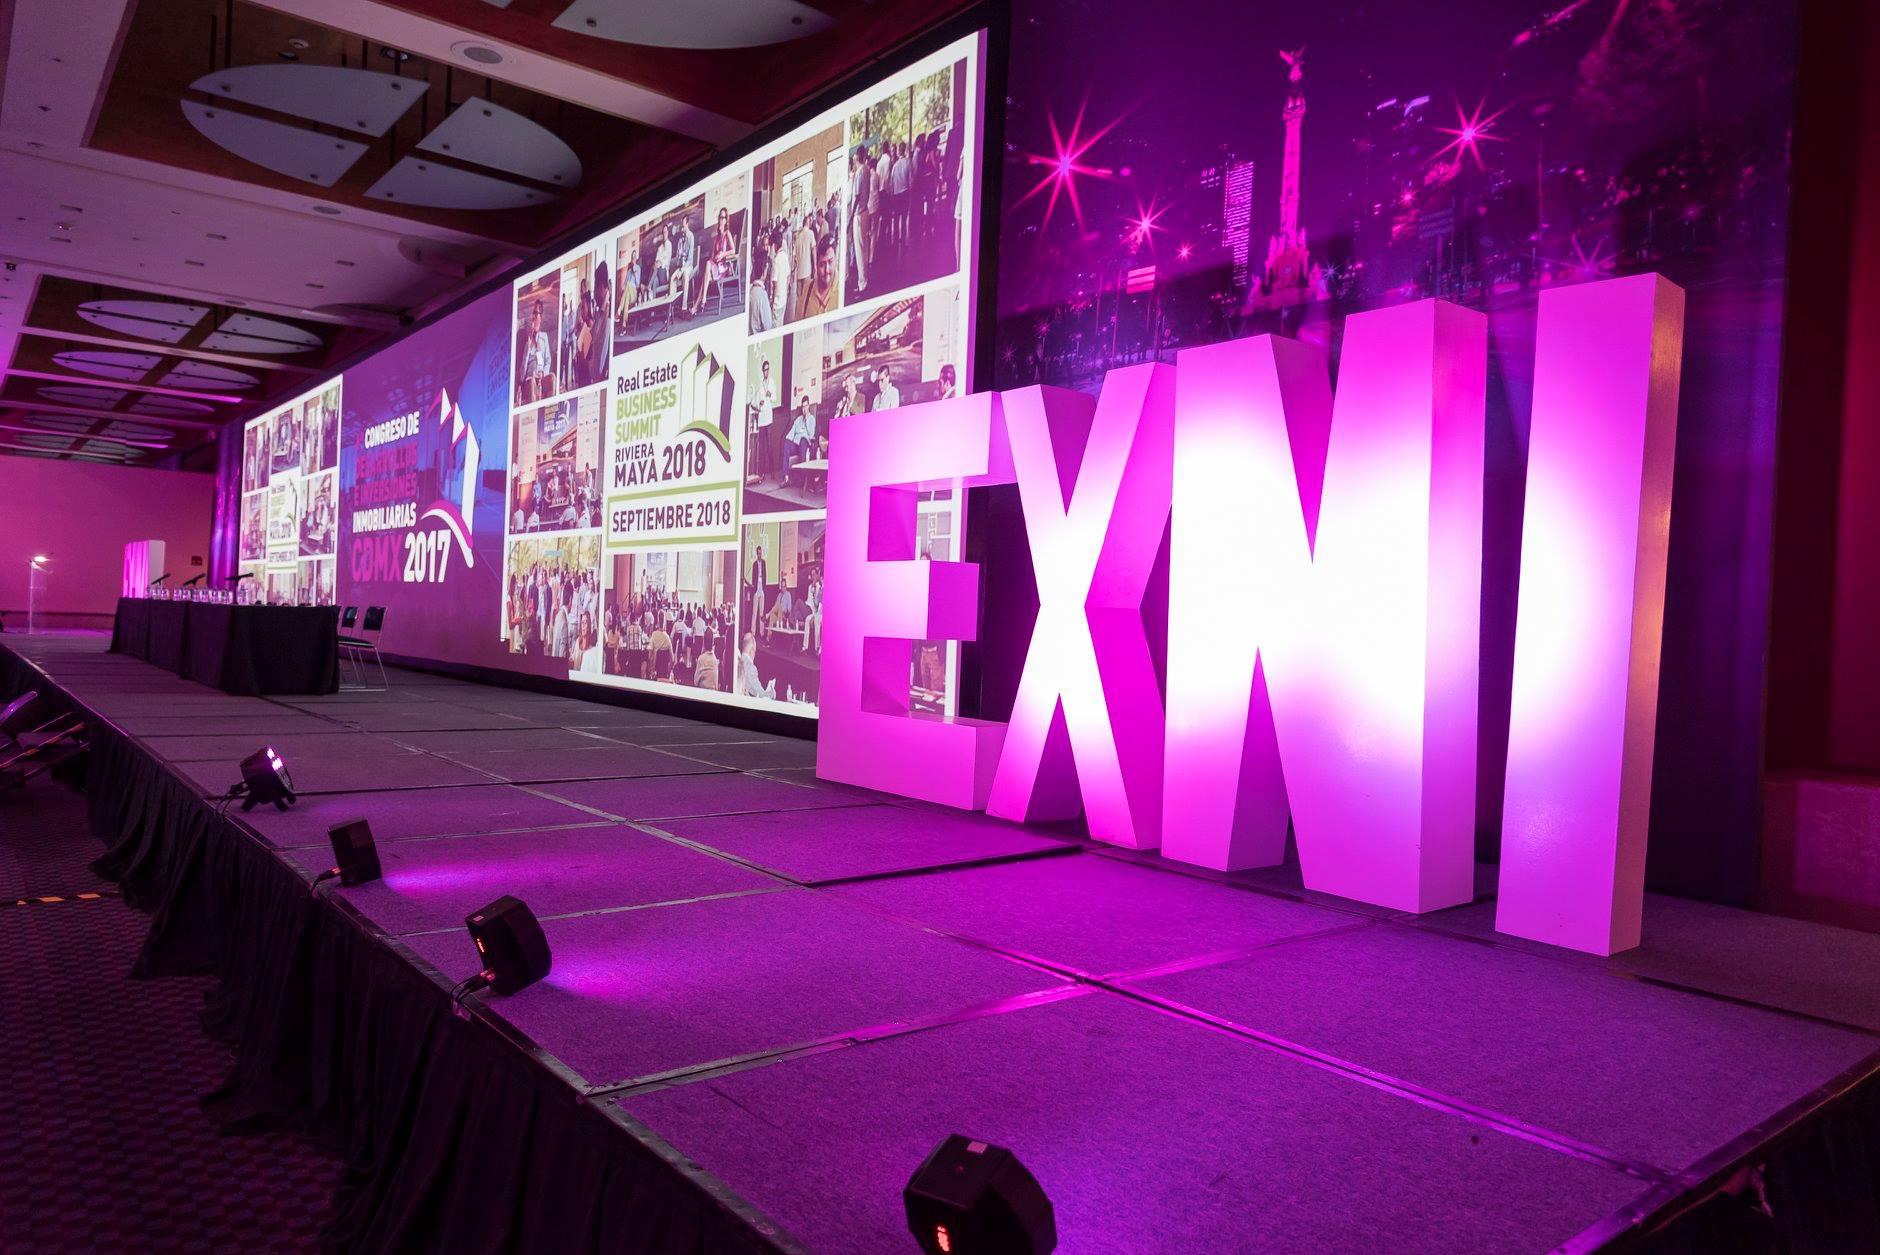 EXNI, la cumbre inmobiliaria que reúne a expertos del sector